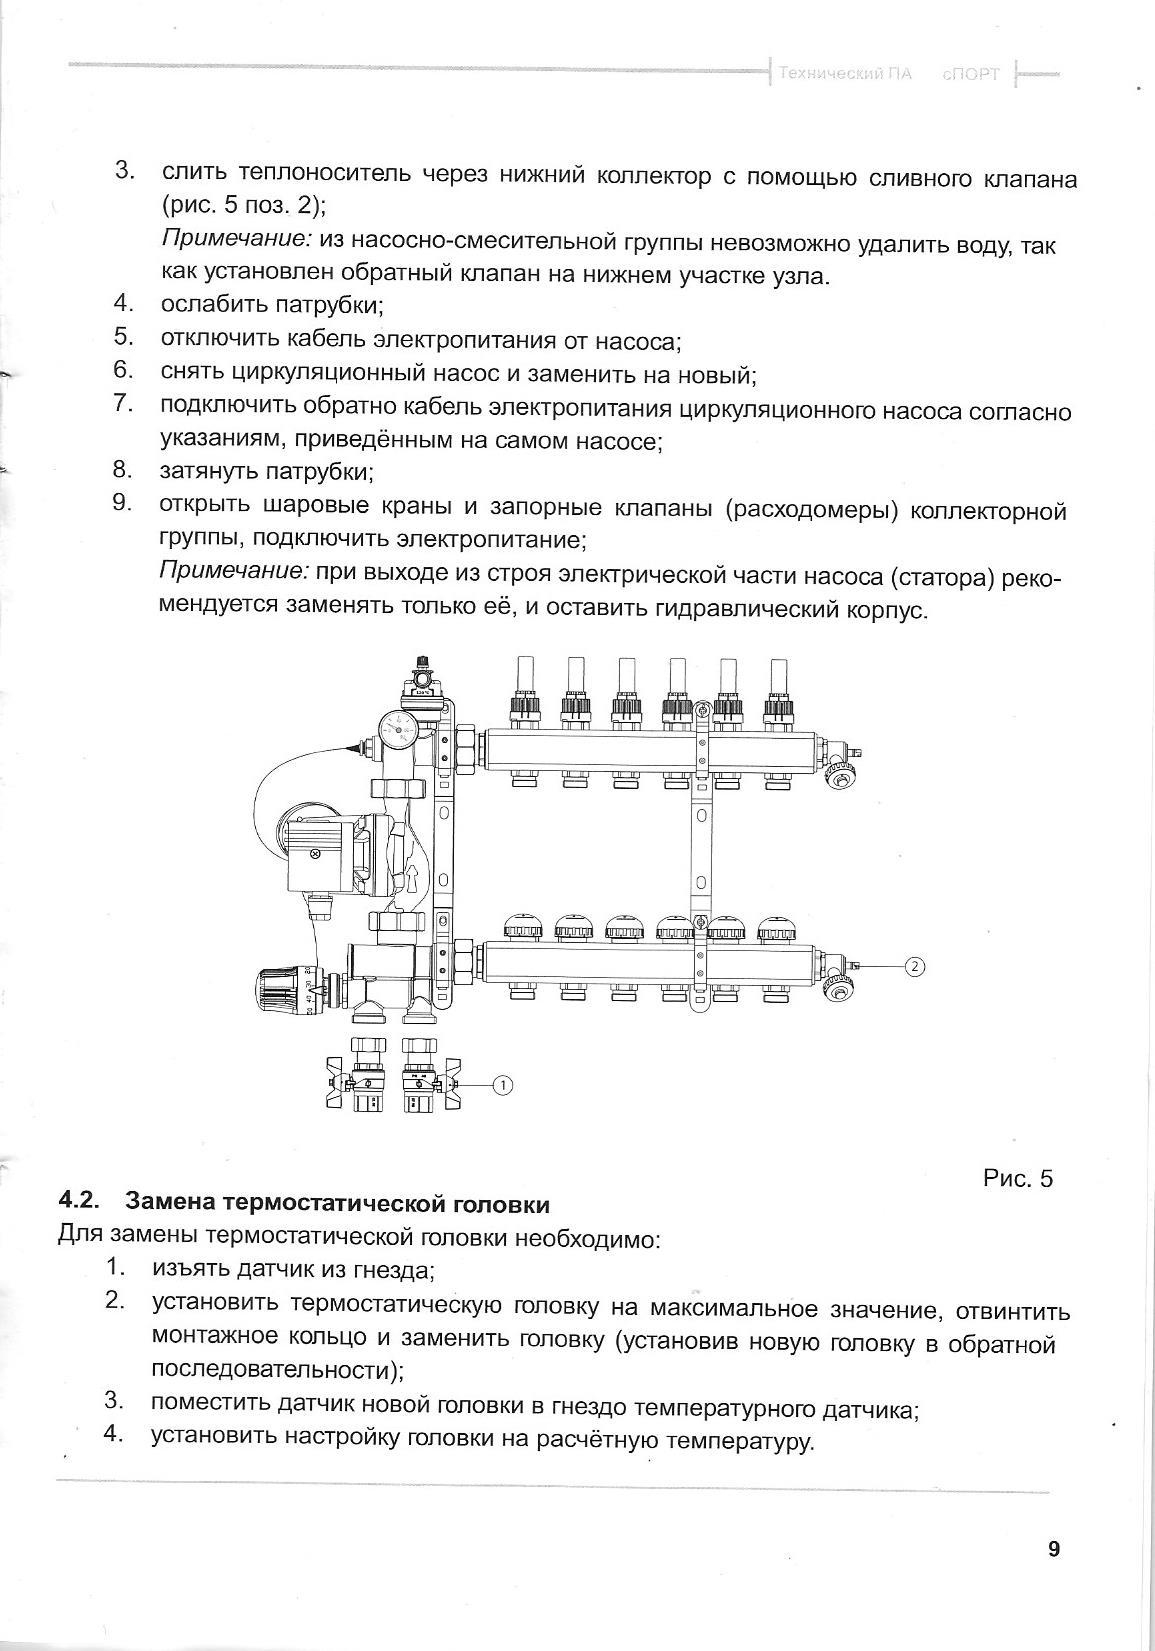 стр 8